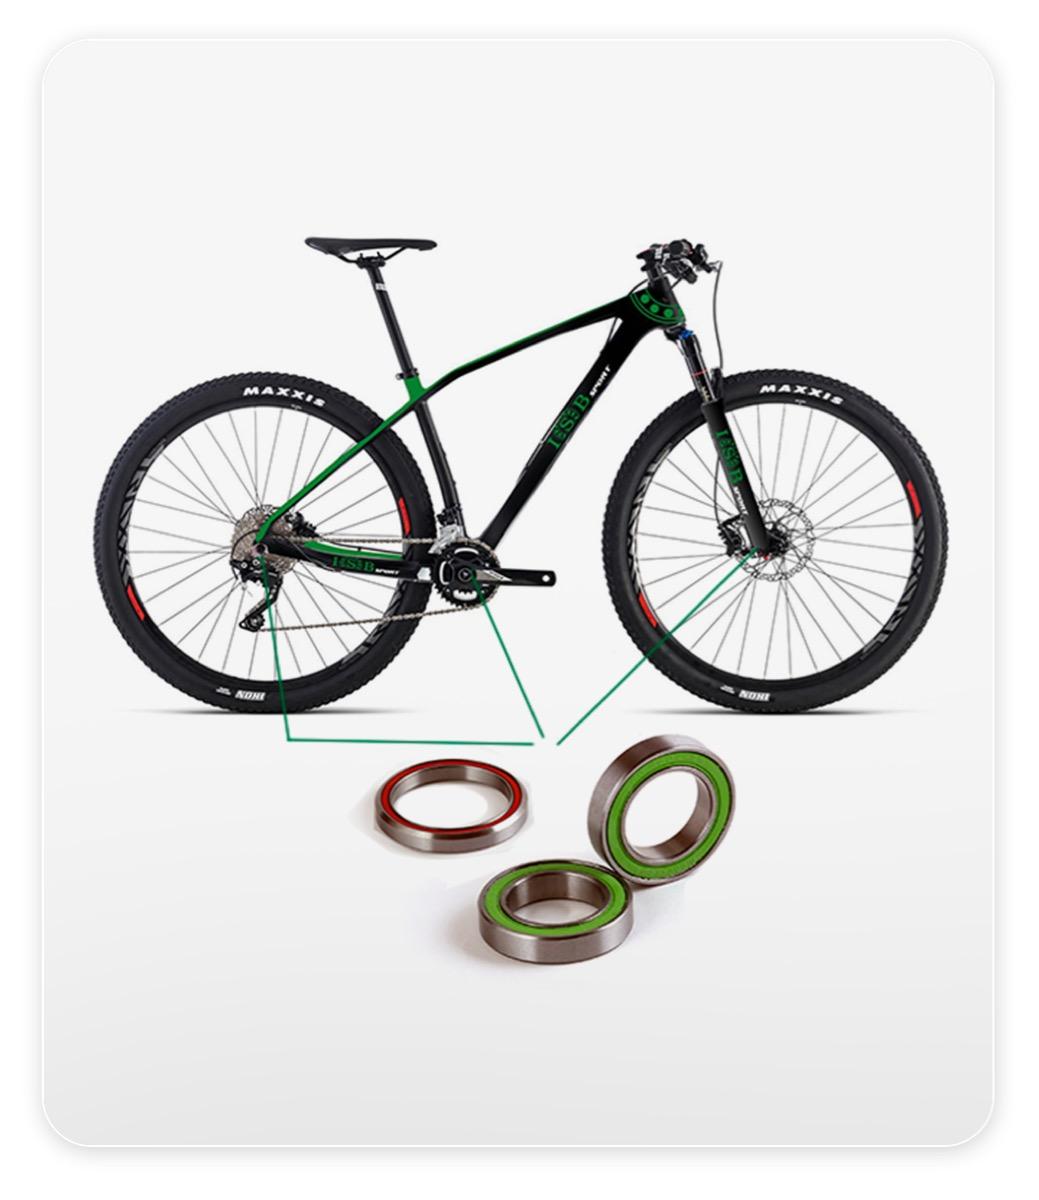 Rodamientos para bicicleta